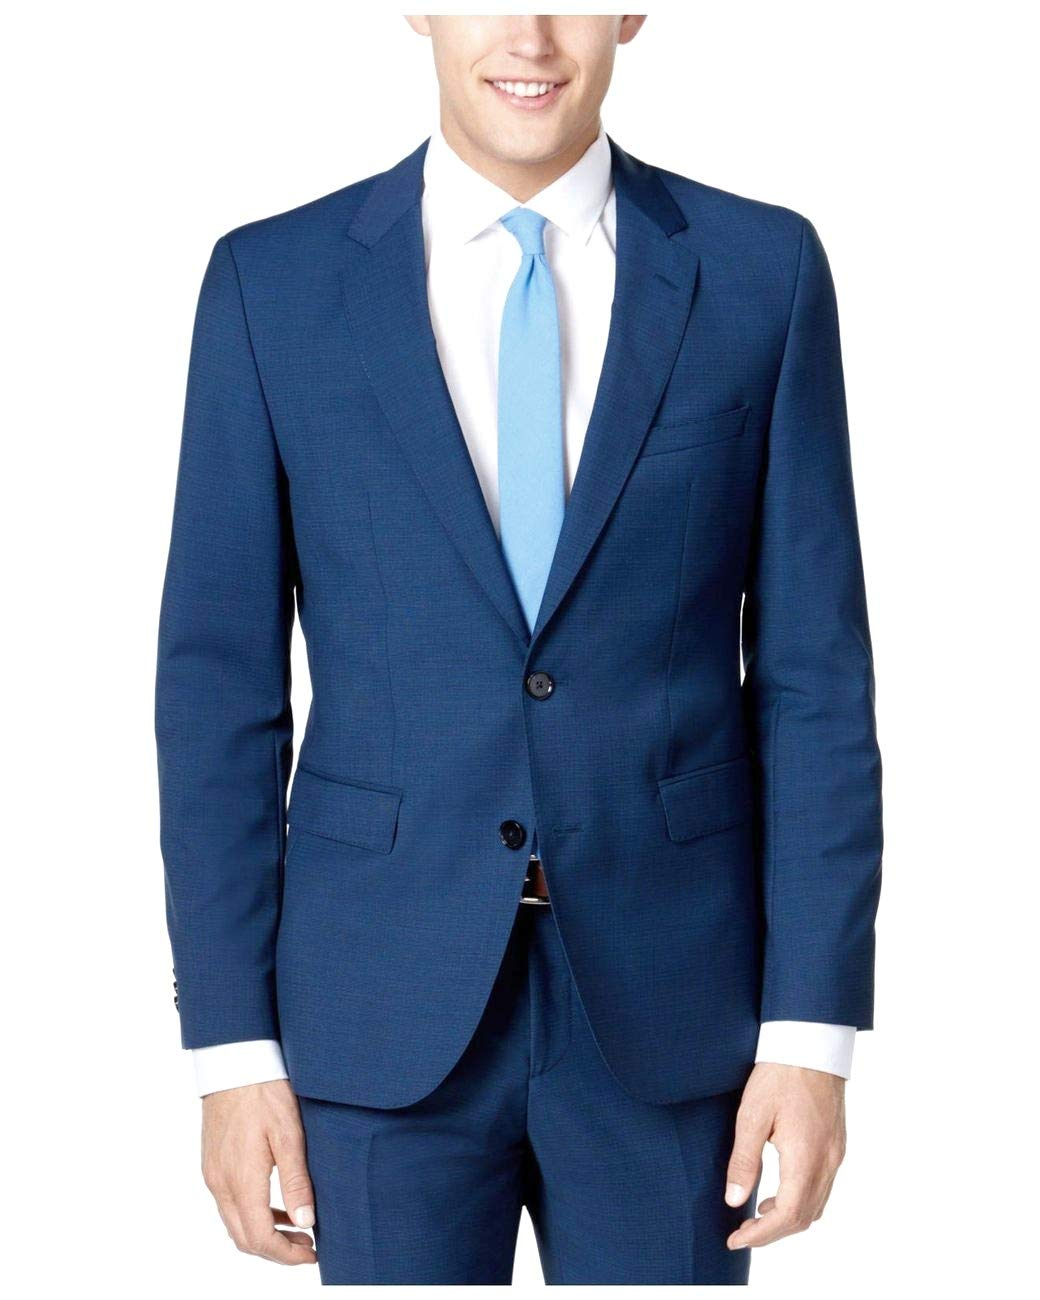 92330c7c0 Hugo Boss 2 Piece Set Slim Fit Men's Suit Wool C-Jeffery/C-Simmons Micro  Check Blue Retail Price $695.00 – Shop New York Style Guide